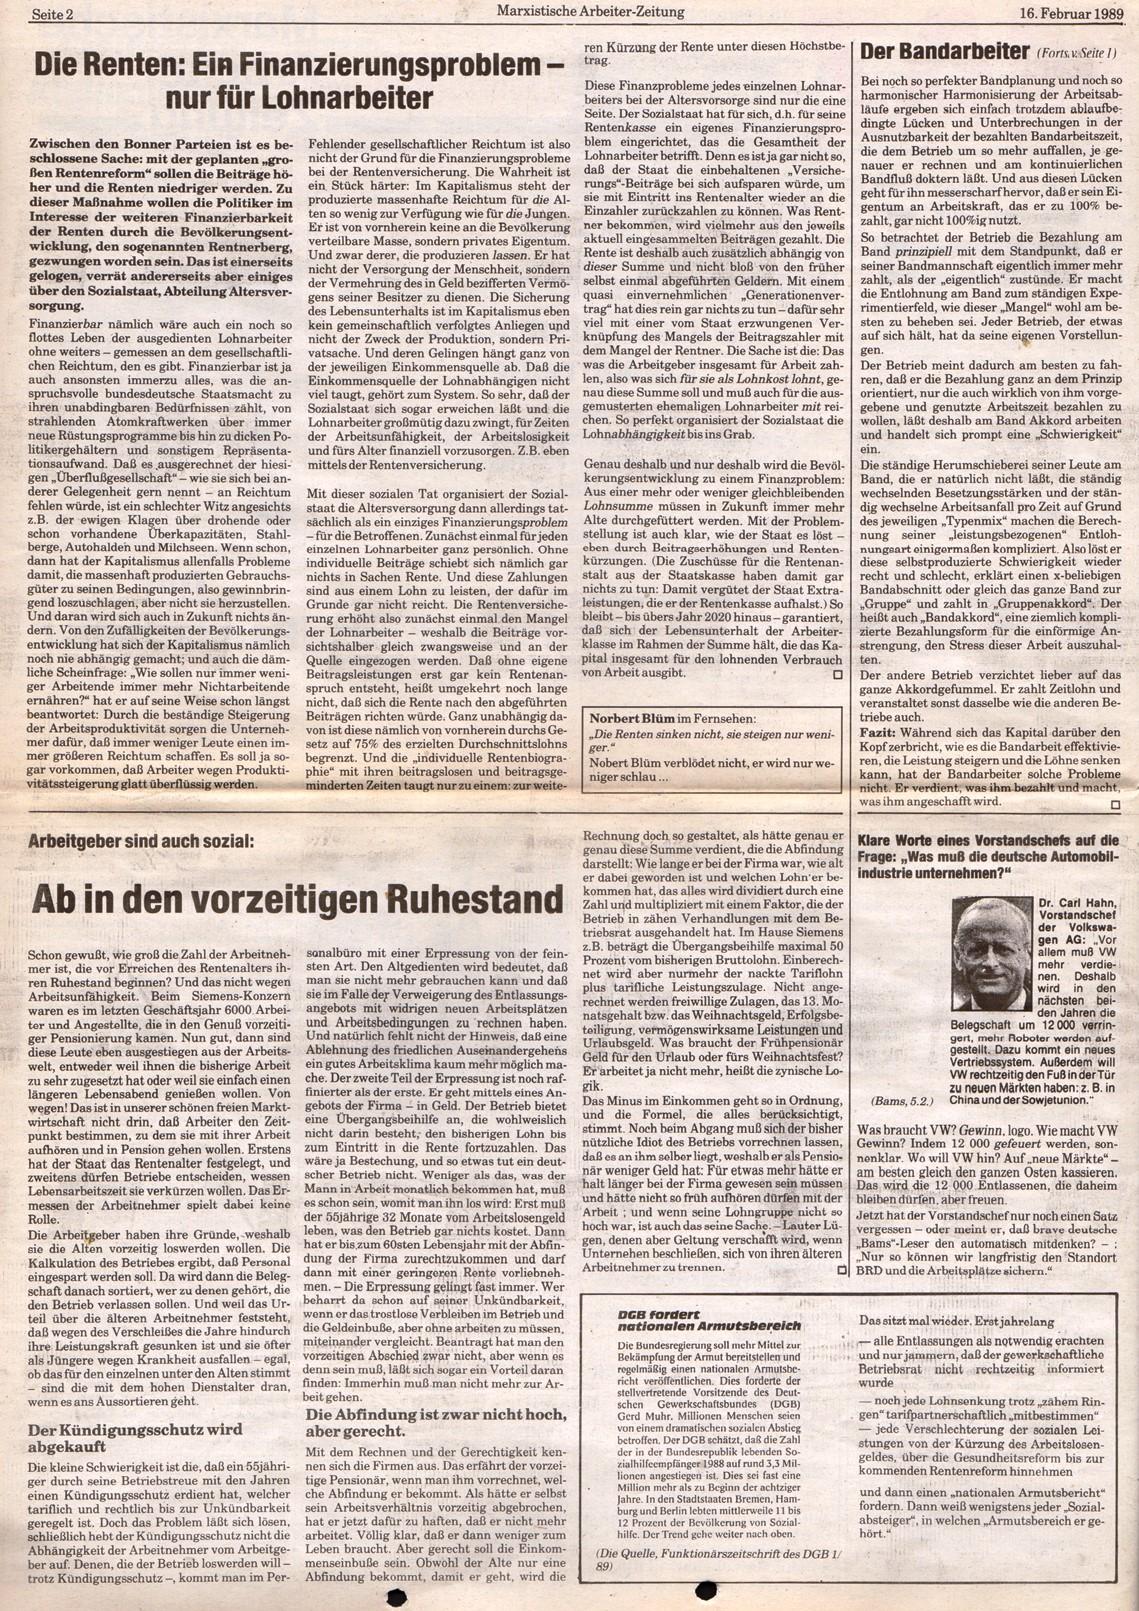 Muenchen_MG_MAZ_19890216_02